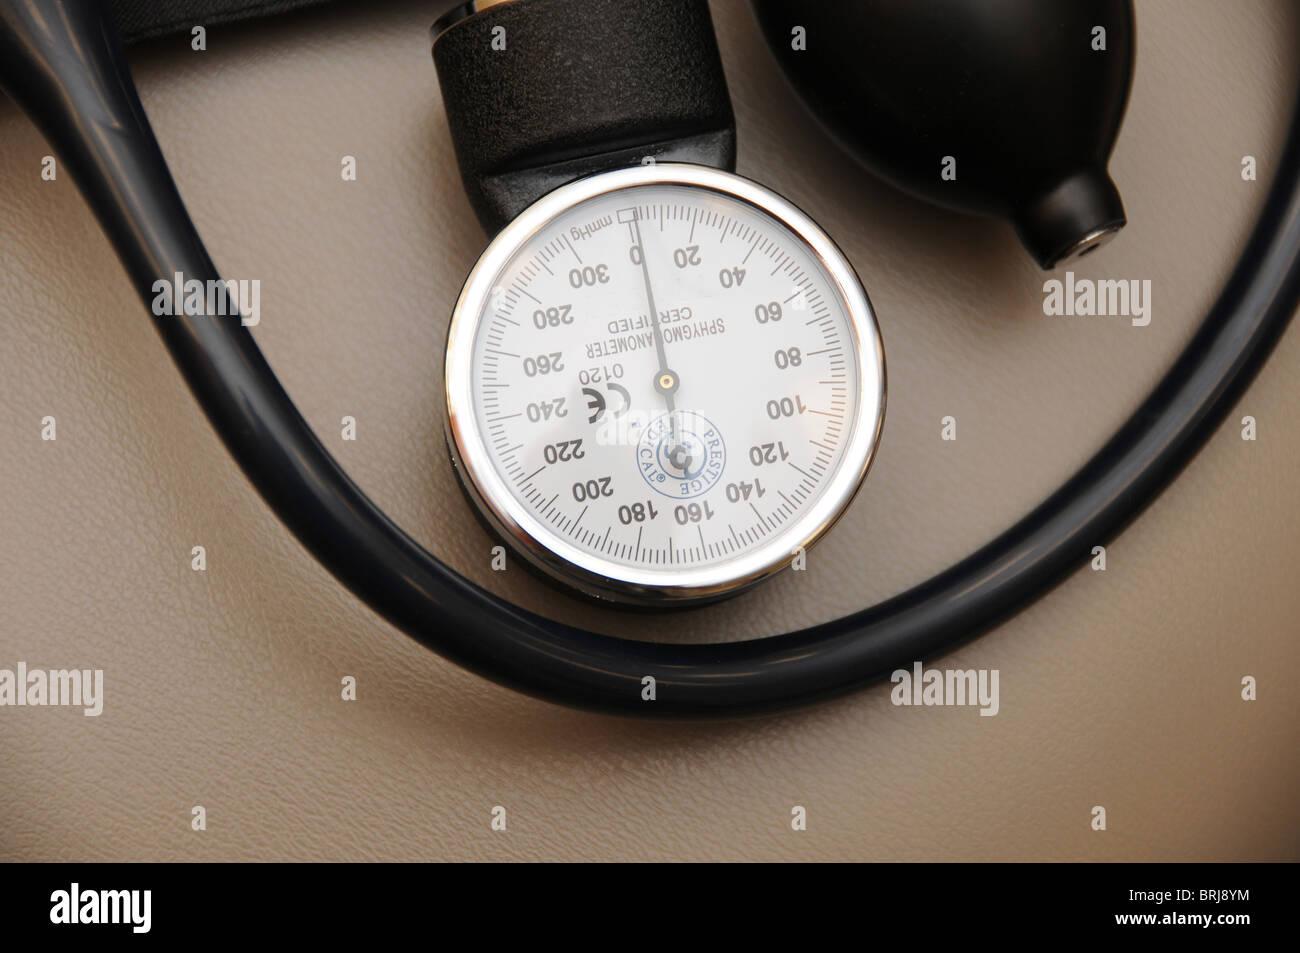 College of nursing. - Stock Image